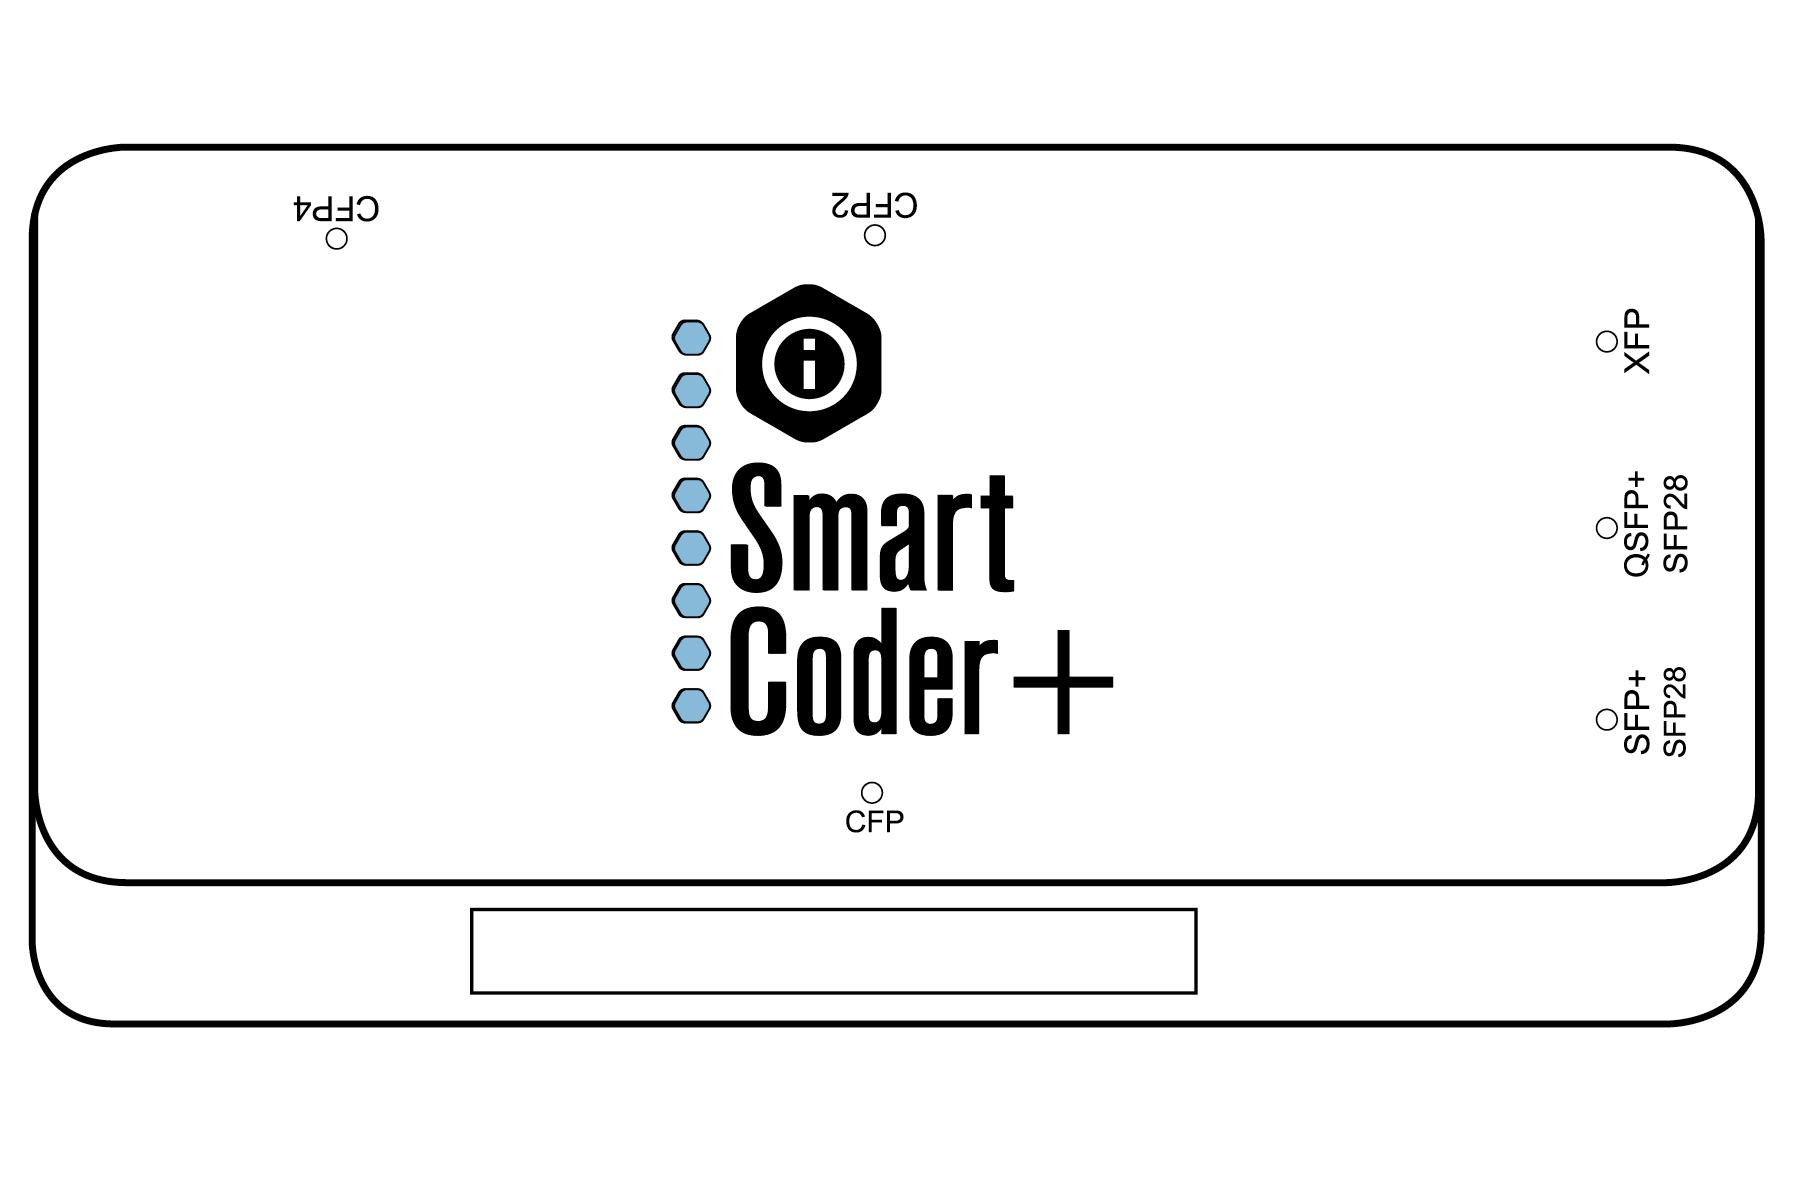 Smart Coder+